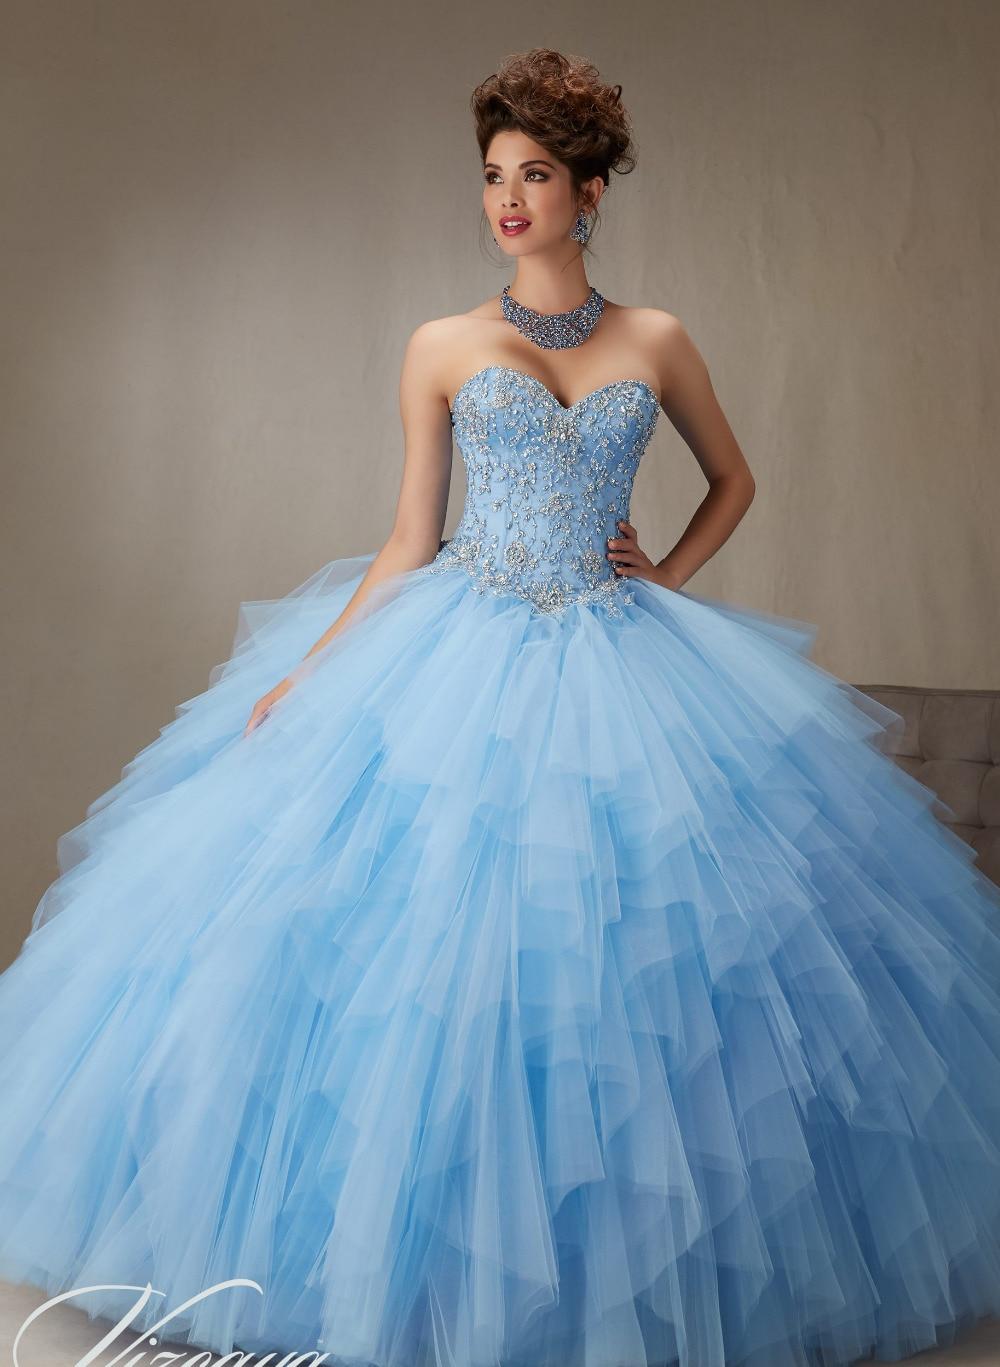 Aliexpress.com : Buy Vestidos de 15 anos Cheap Quinceanera ...